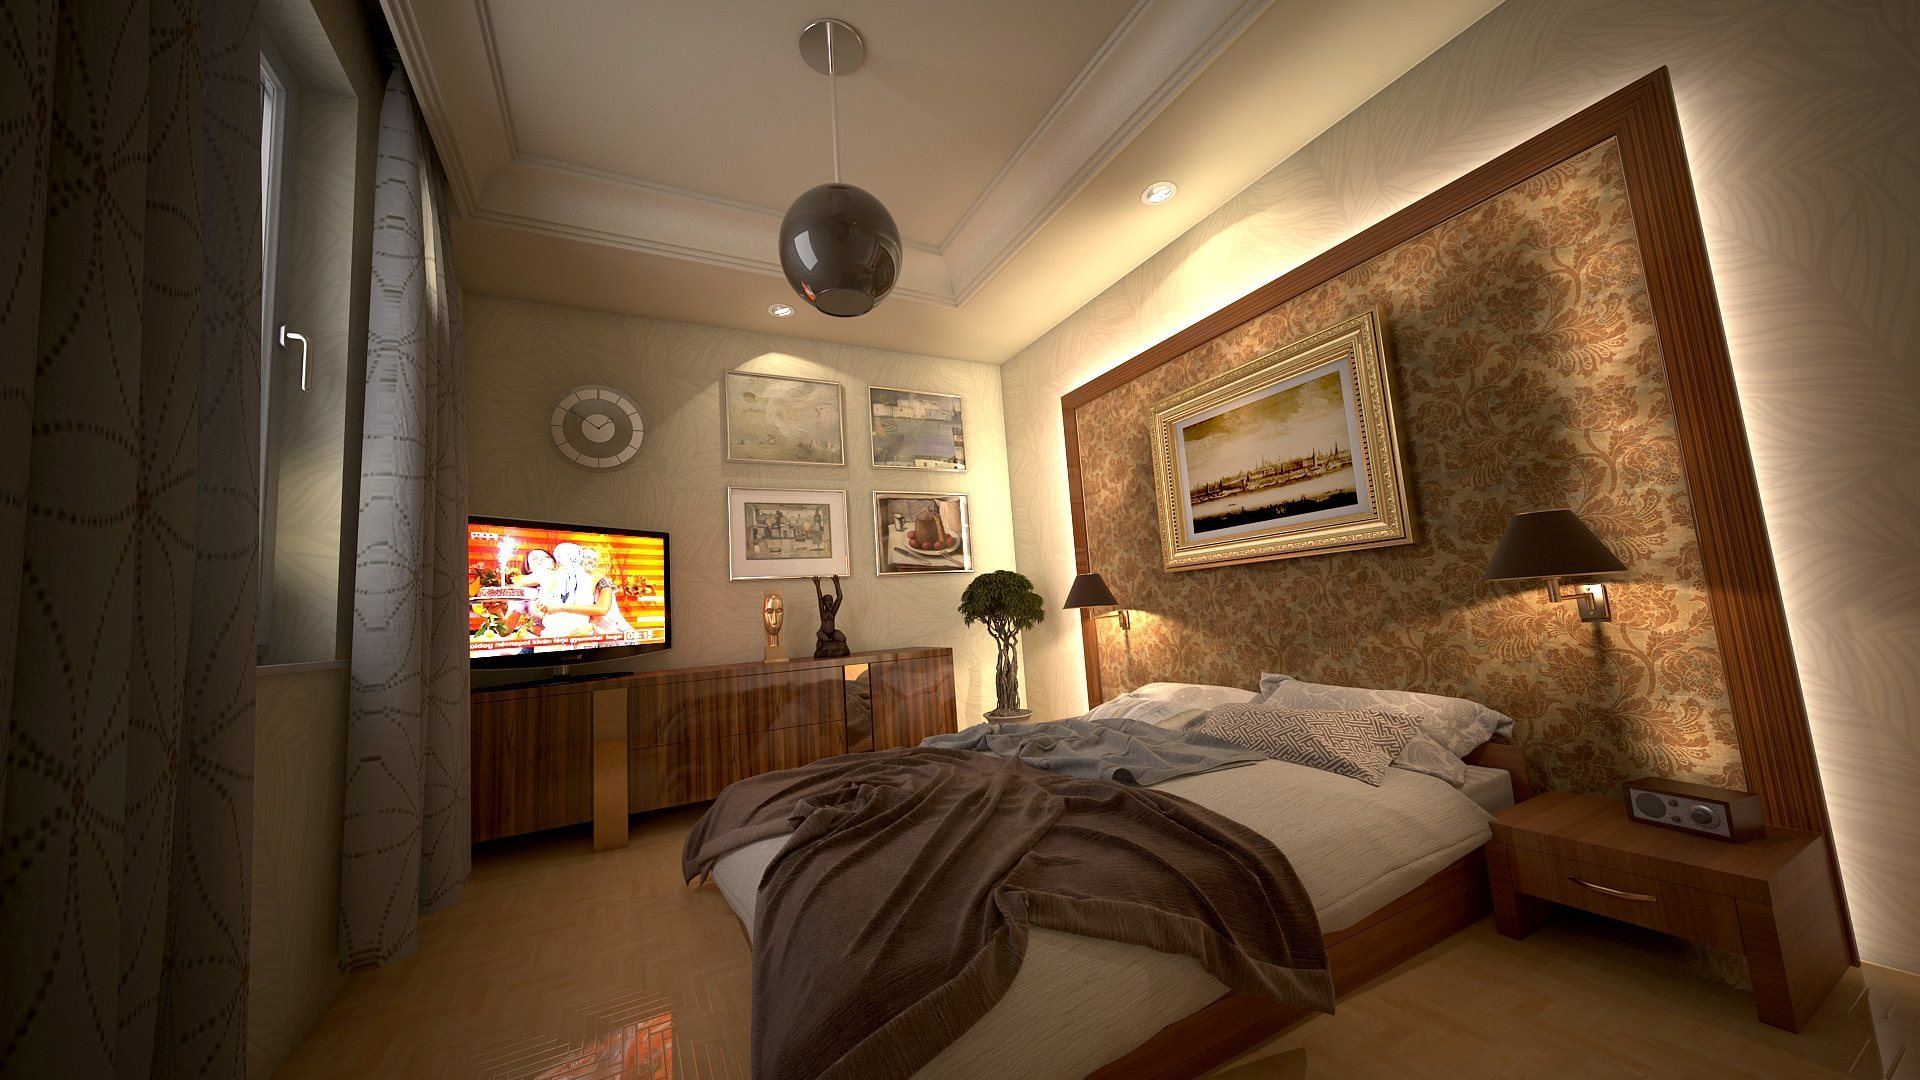 Bedroom design hd wallpapers 4k - Deco de chambre adulte moderne ...